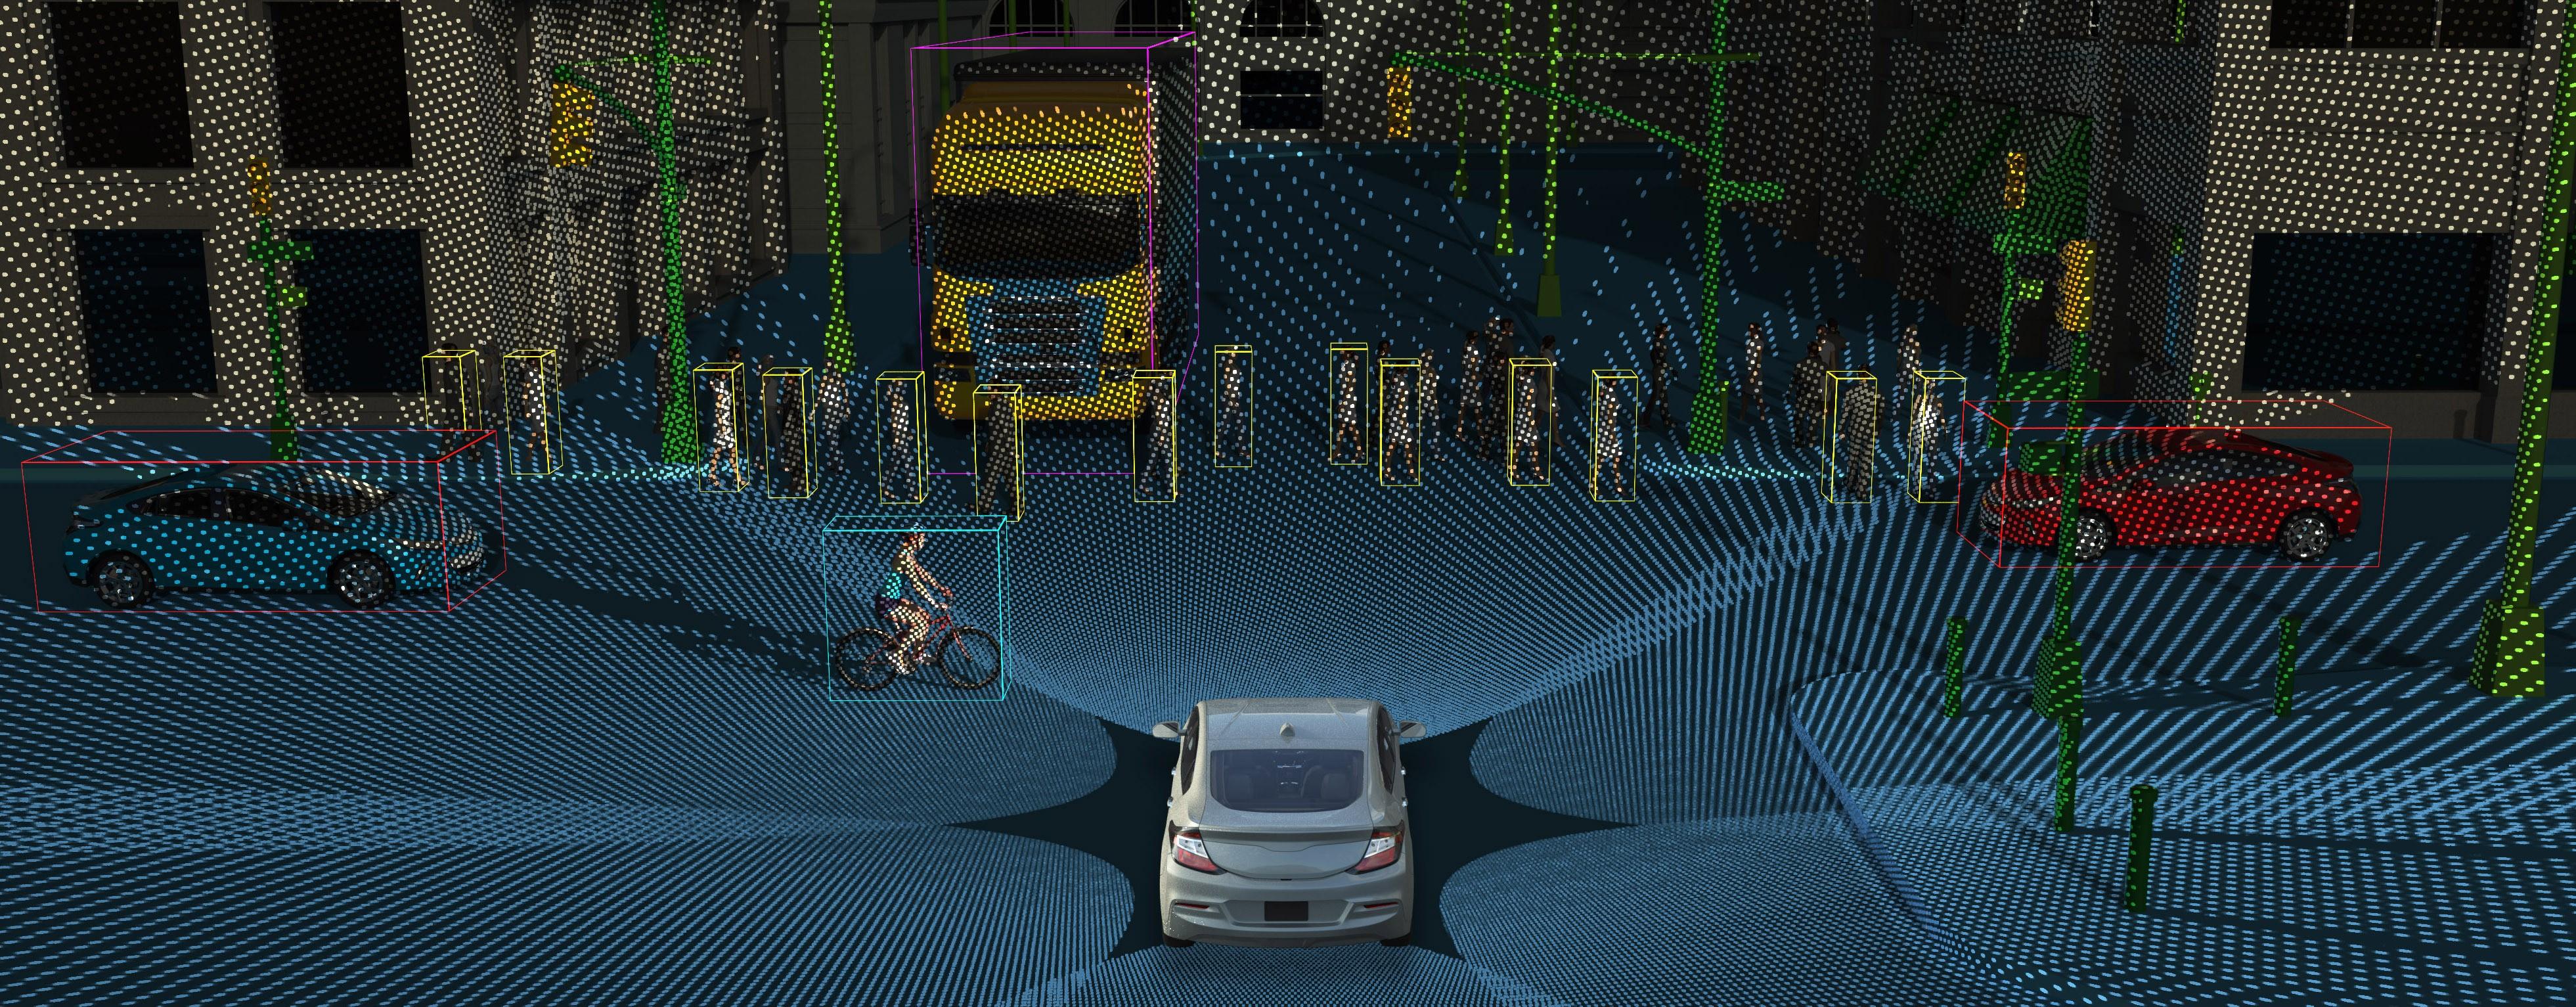 Sistema usa inteligência artificial para imitar a forma como o cérebro processa imagens. (Foto: AEye)